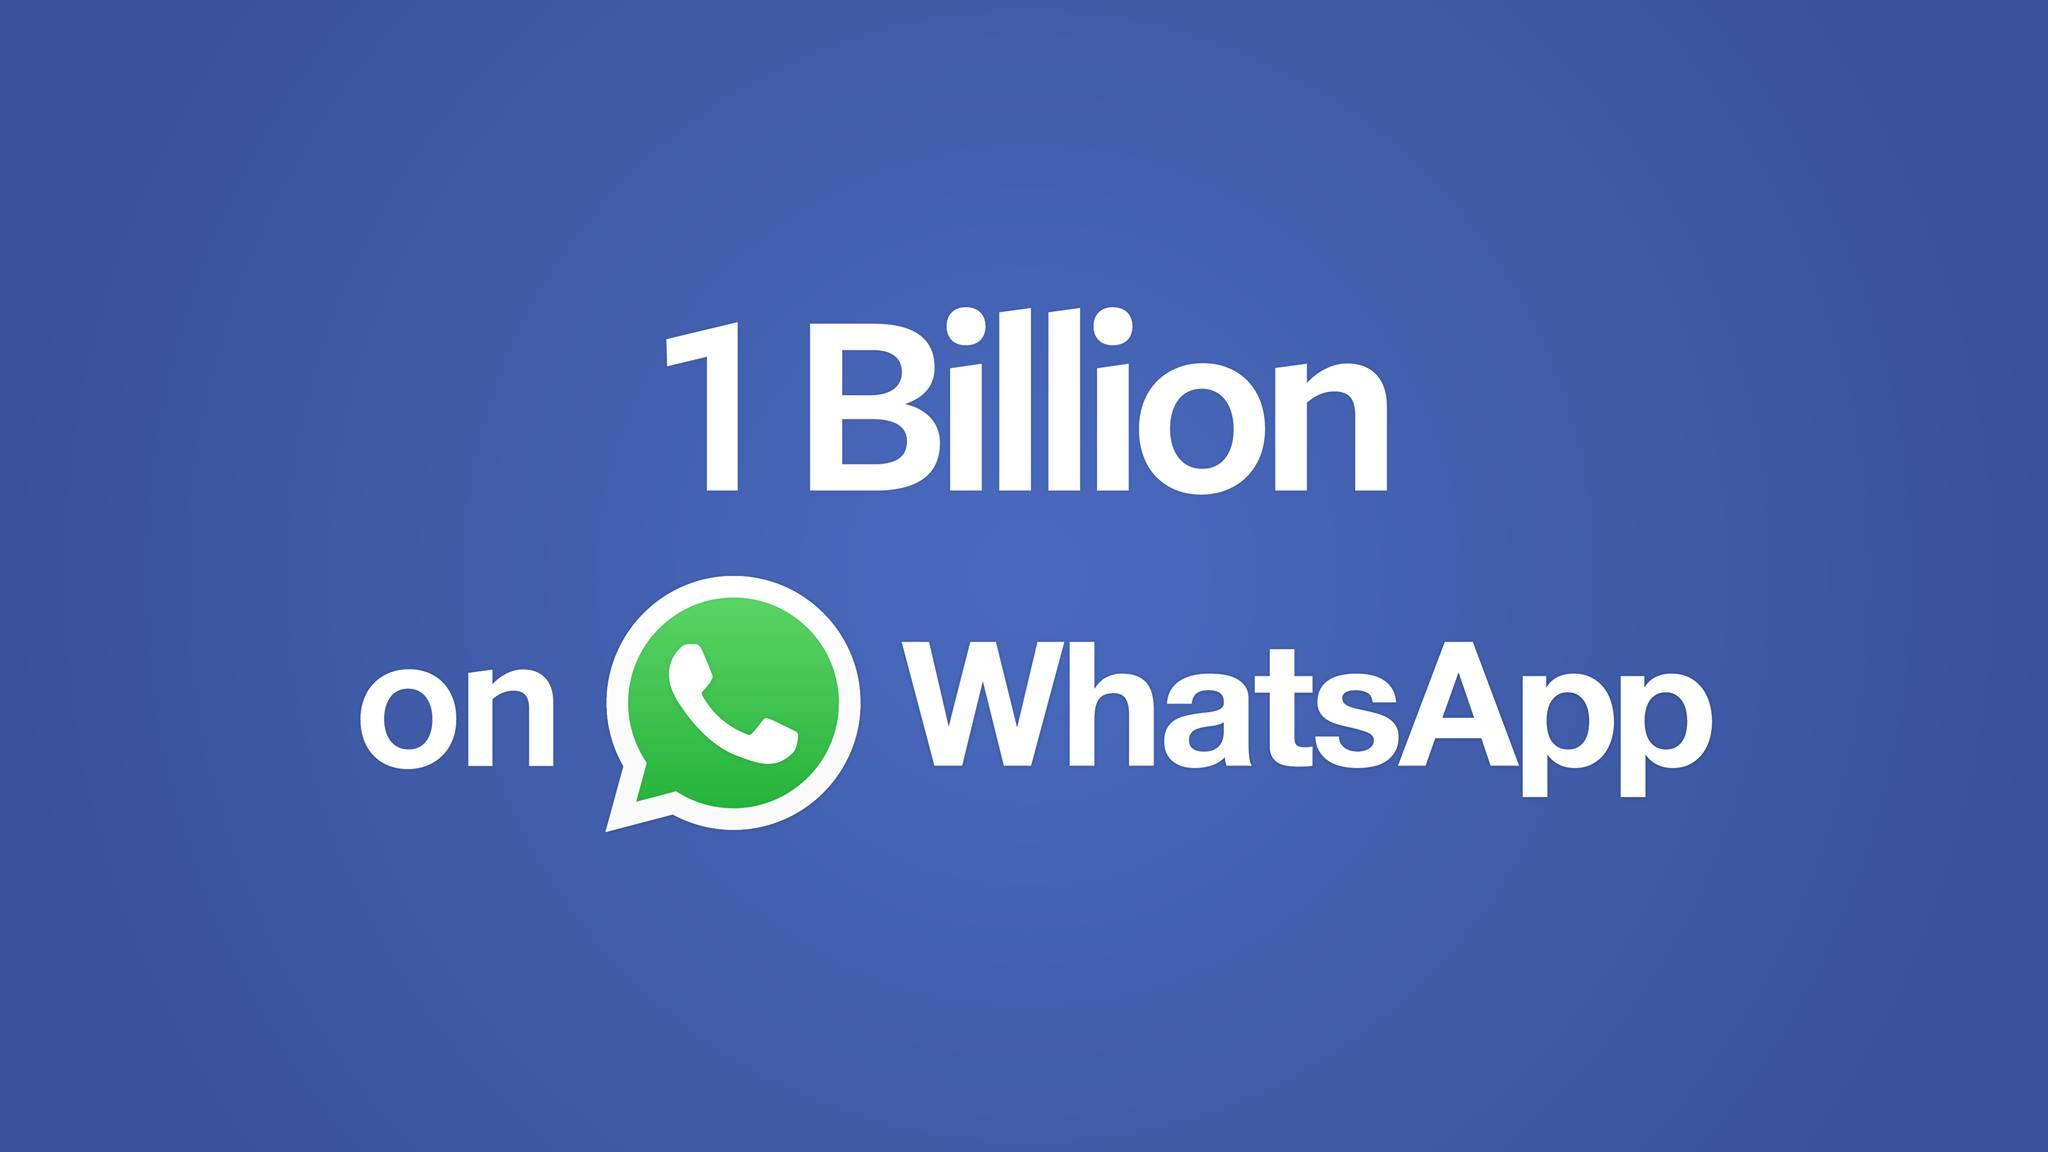 WhatsApp a atins pragul de 1 miliard de utilizatori zilnici